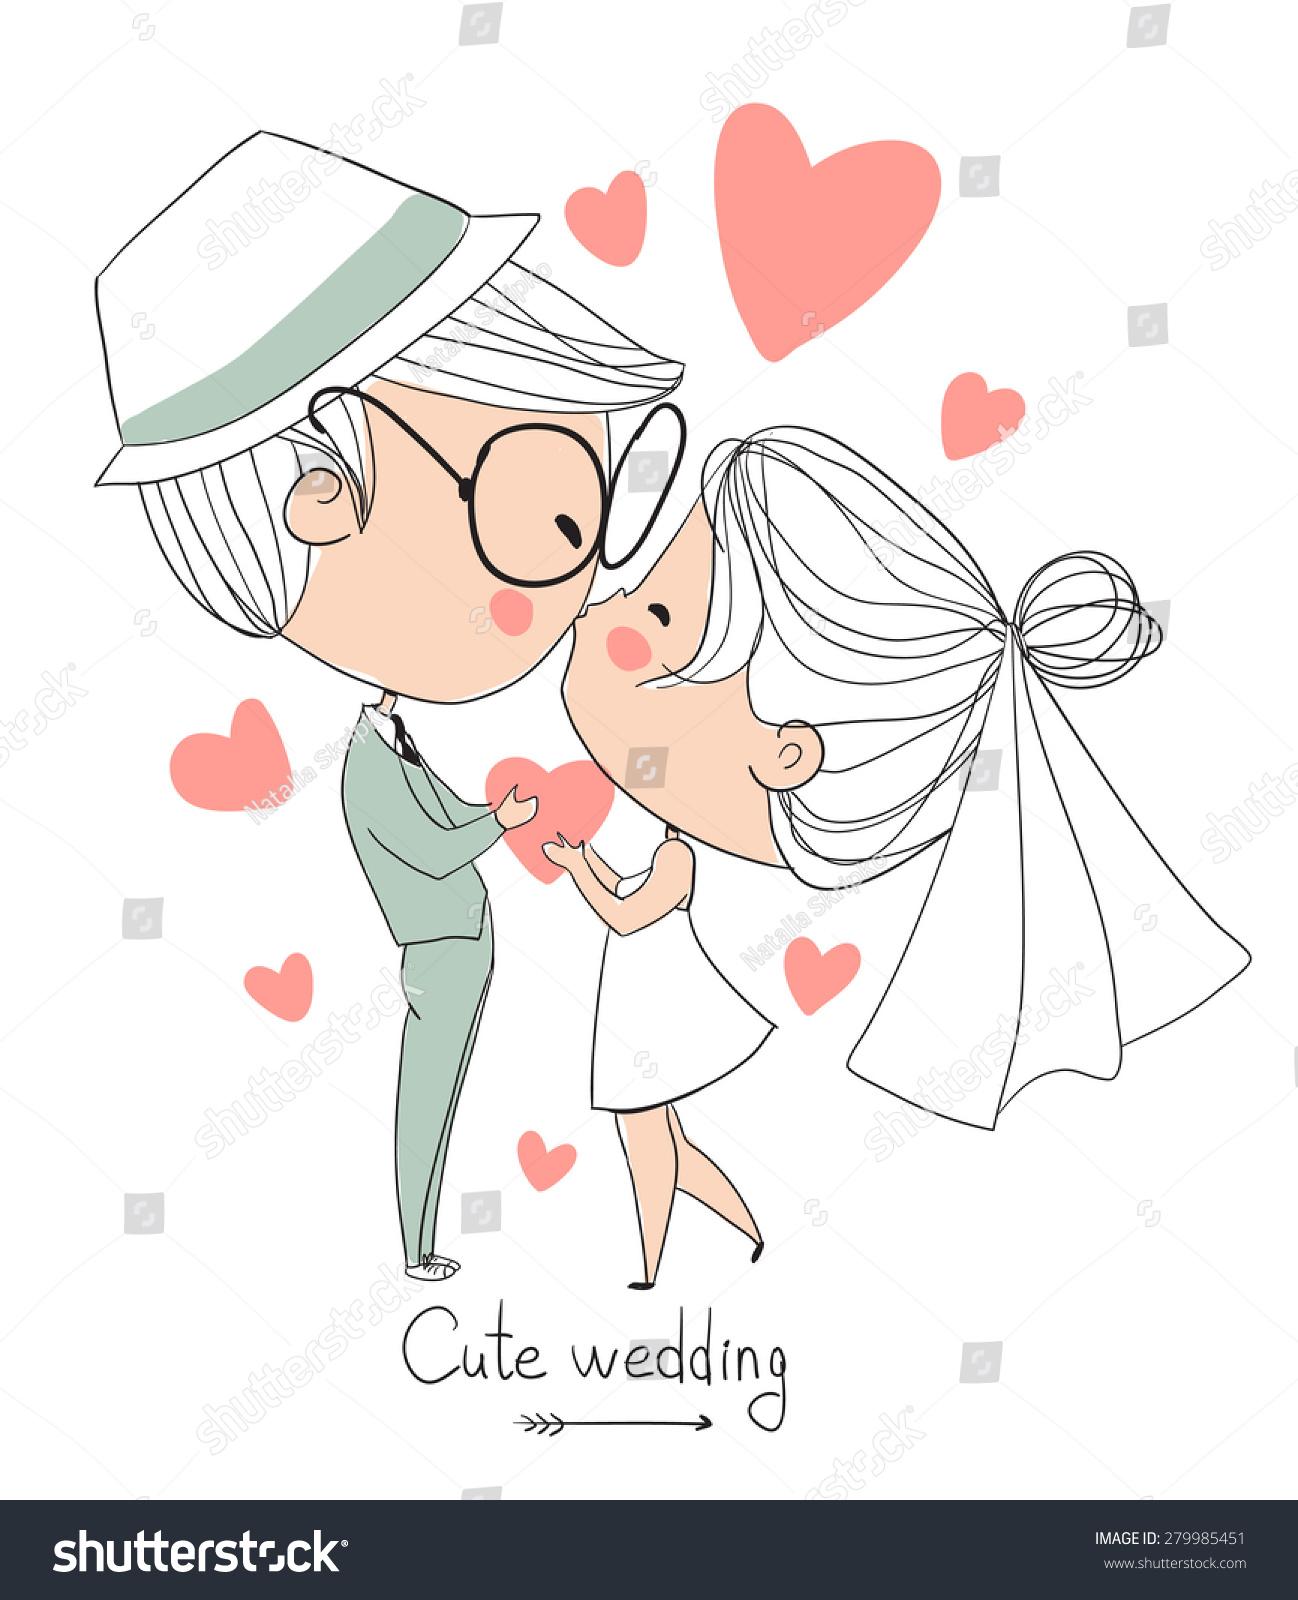 Cute Vector Wedding Card